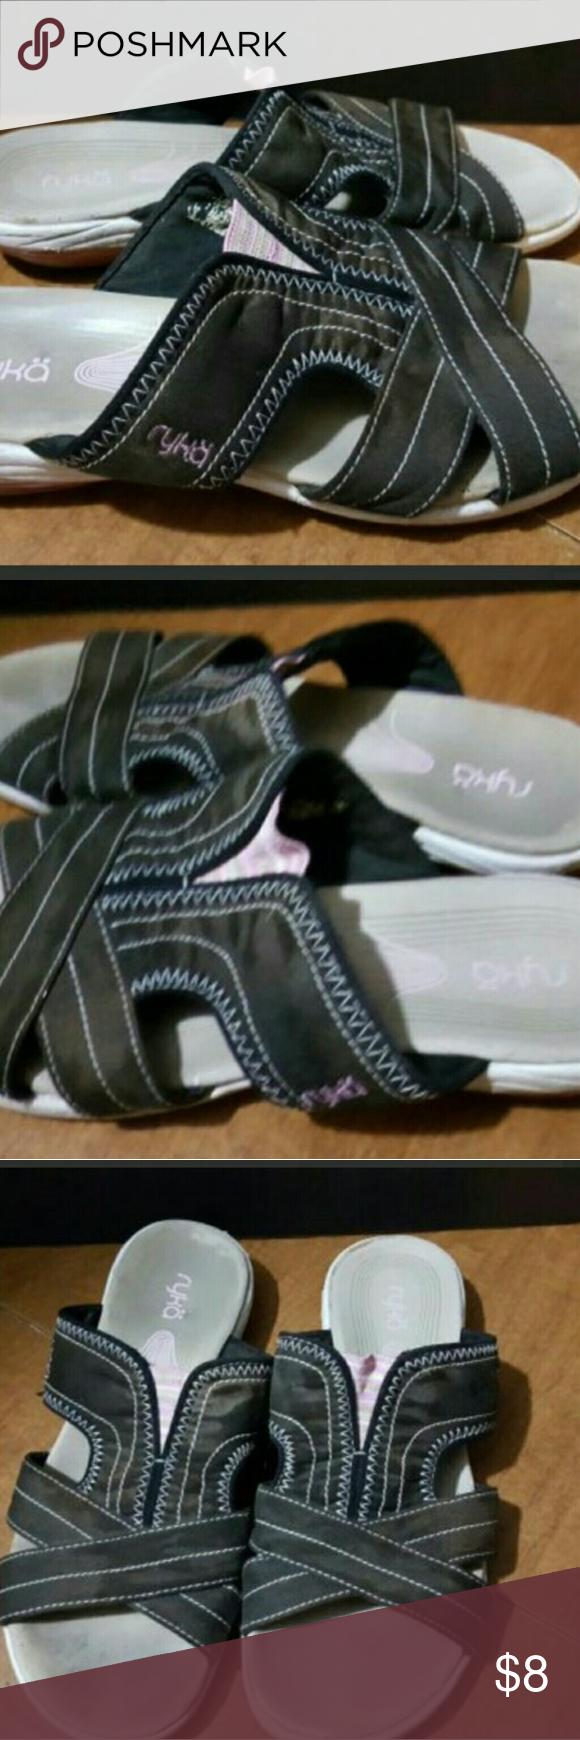 Ryka sandals shoes - Ryka Women S Size 7 8 Slides Sandals Guc Ryka Women S Size 7 8 Slides